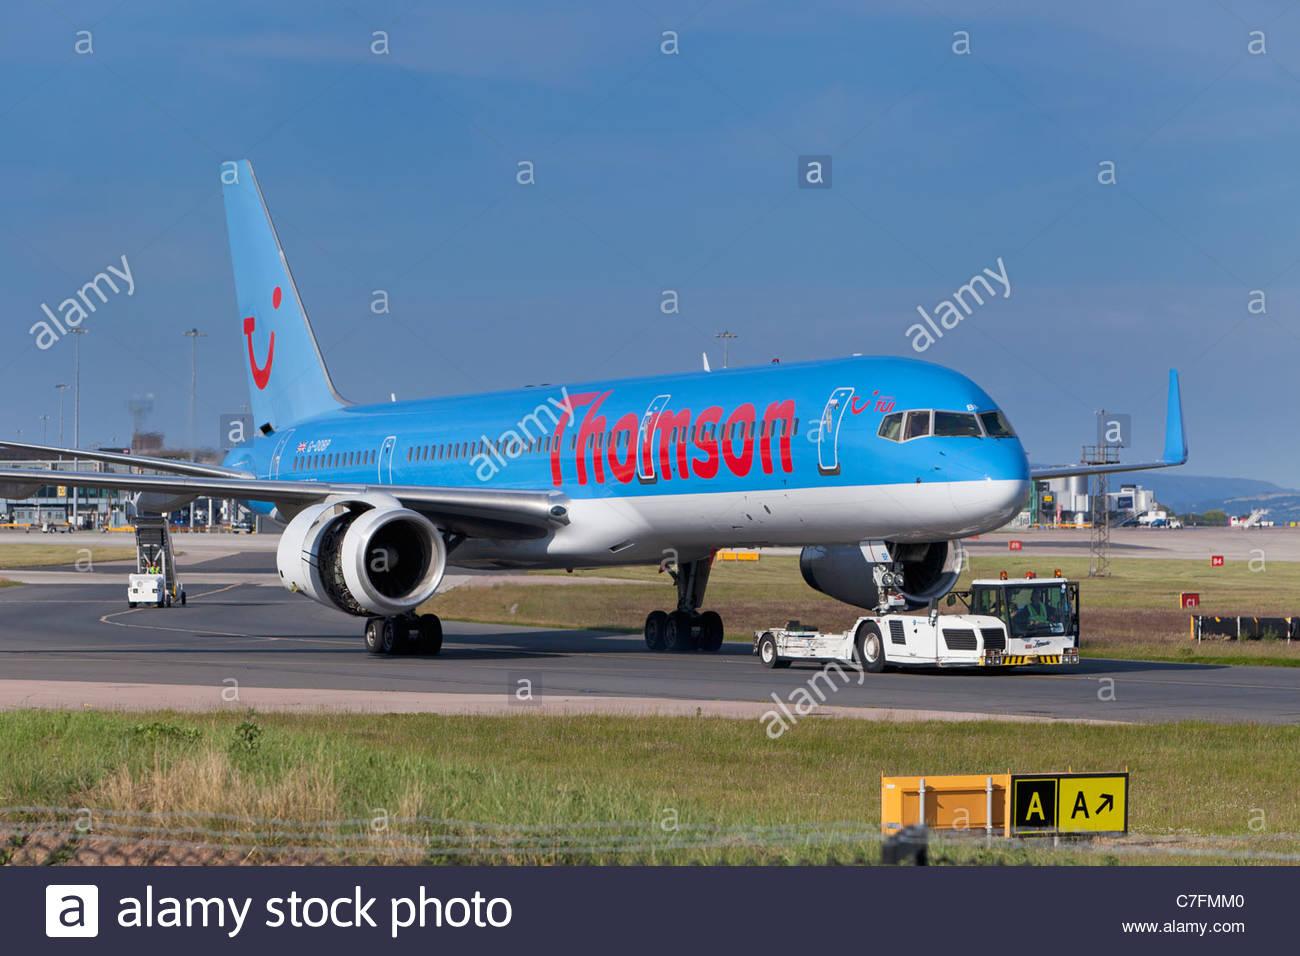 A Thomson fly.com airplane, England - Stock Image